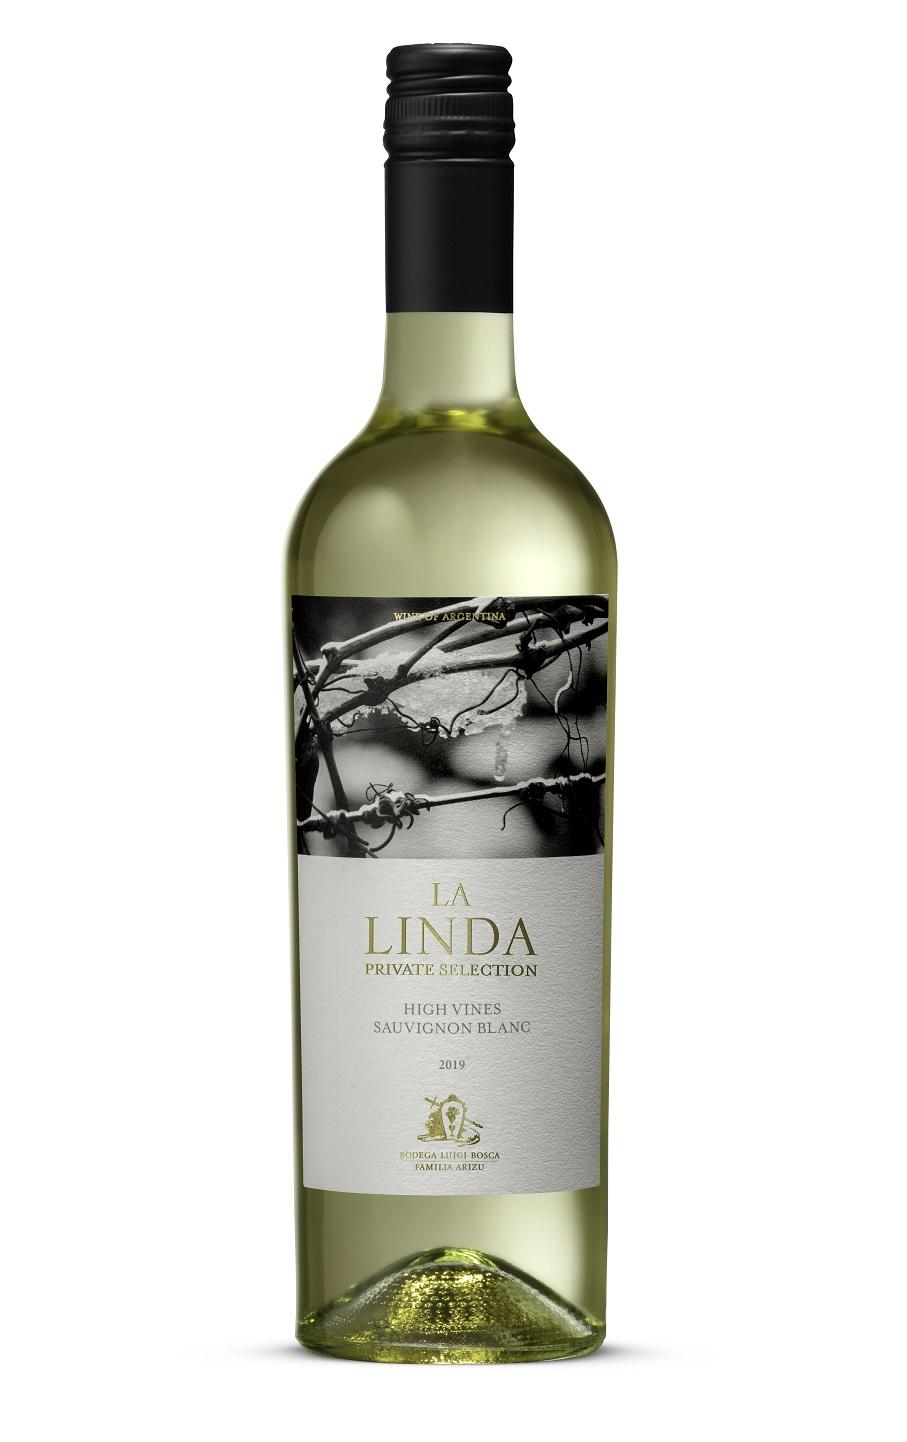 La Linda High Vines Sauvignon Blanc 2018